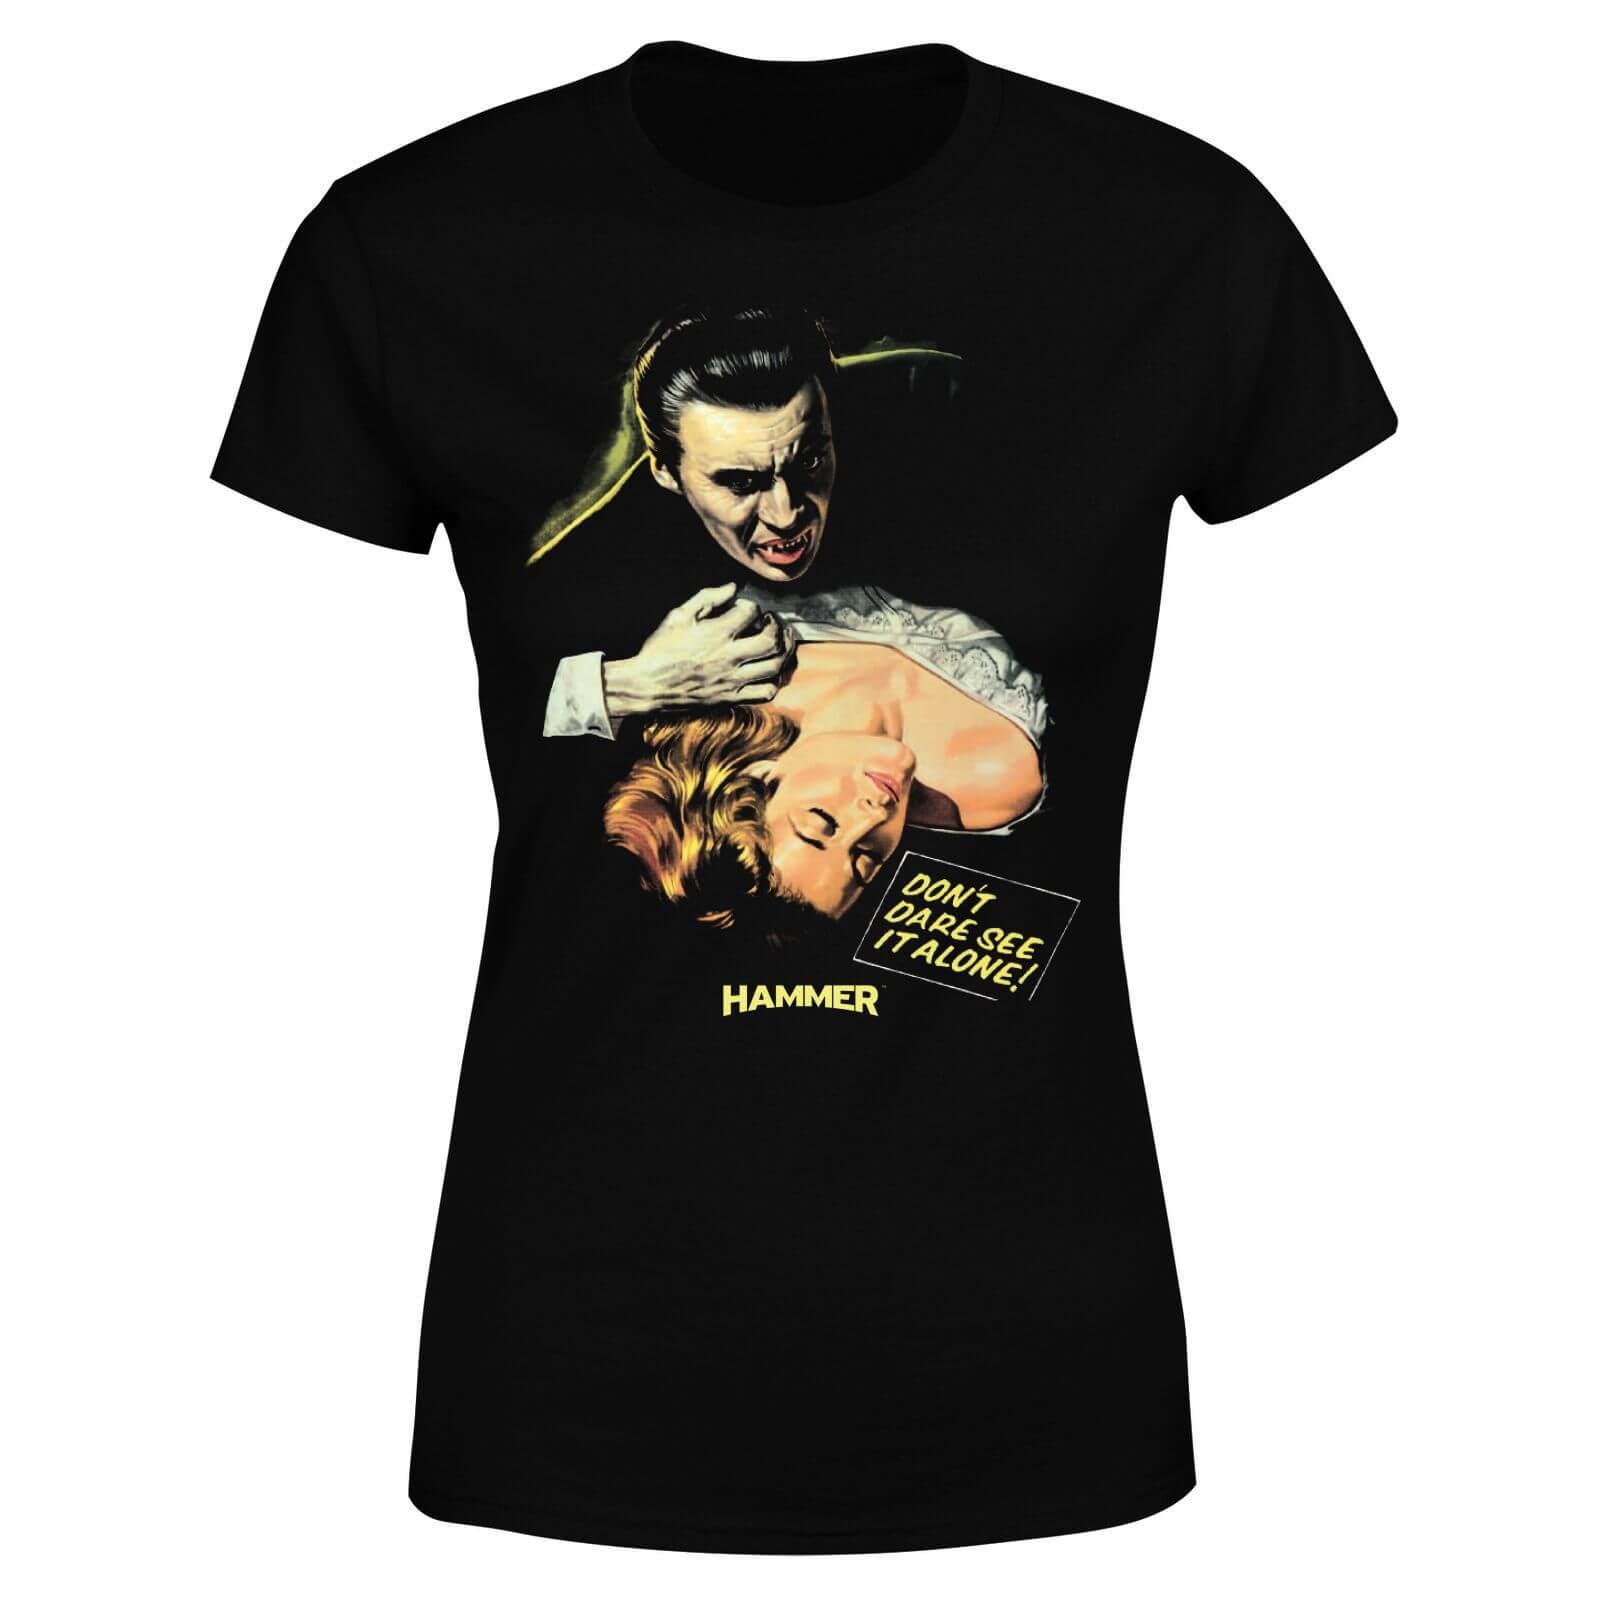 Hammer Horror Dracula Don't Dare See It Alone Women's T-Shirt - Black - 3XL - Black